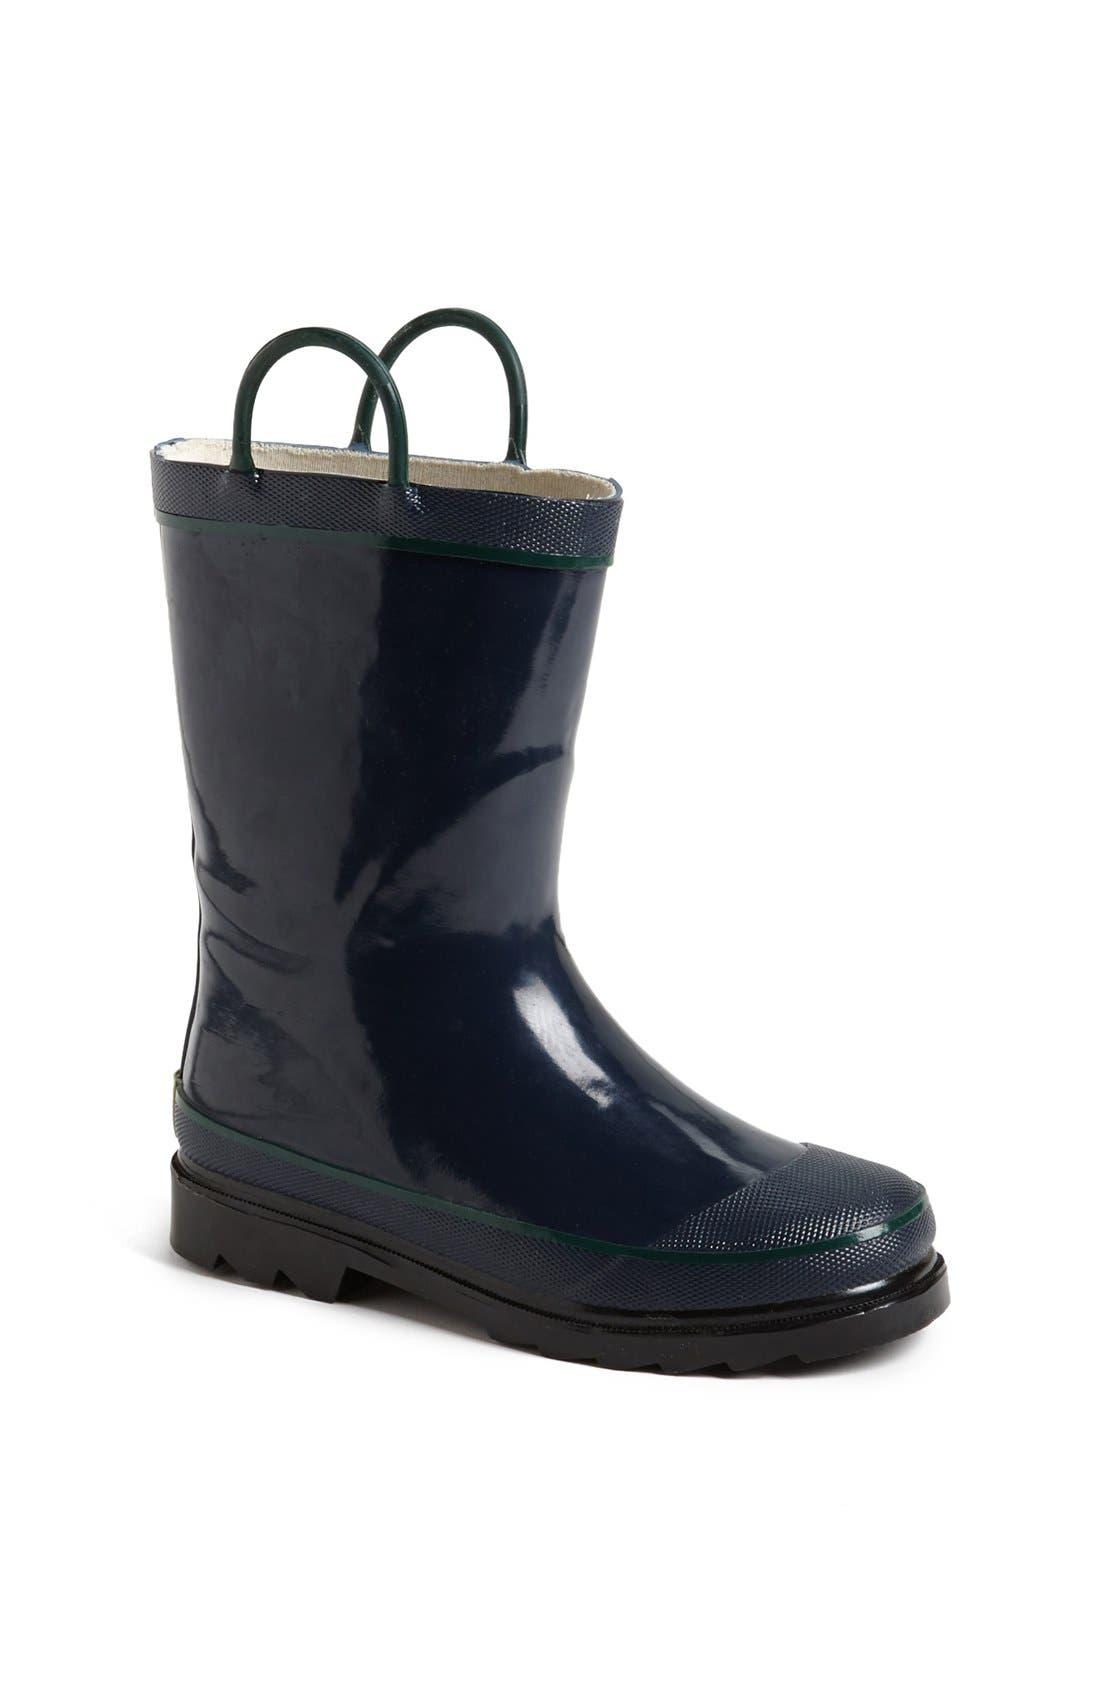 Firechief 2 Waterproof Rain Boot, Main, color, NAVY